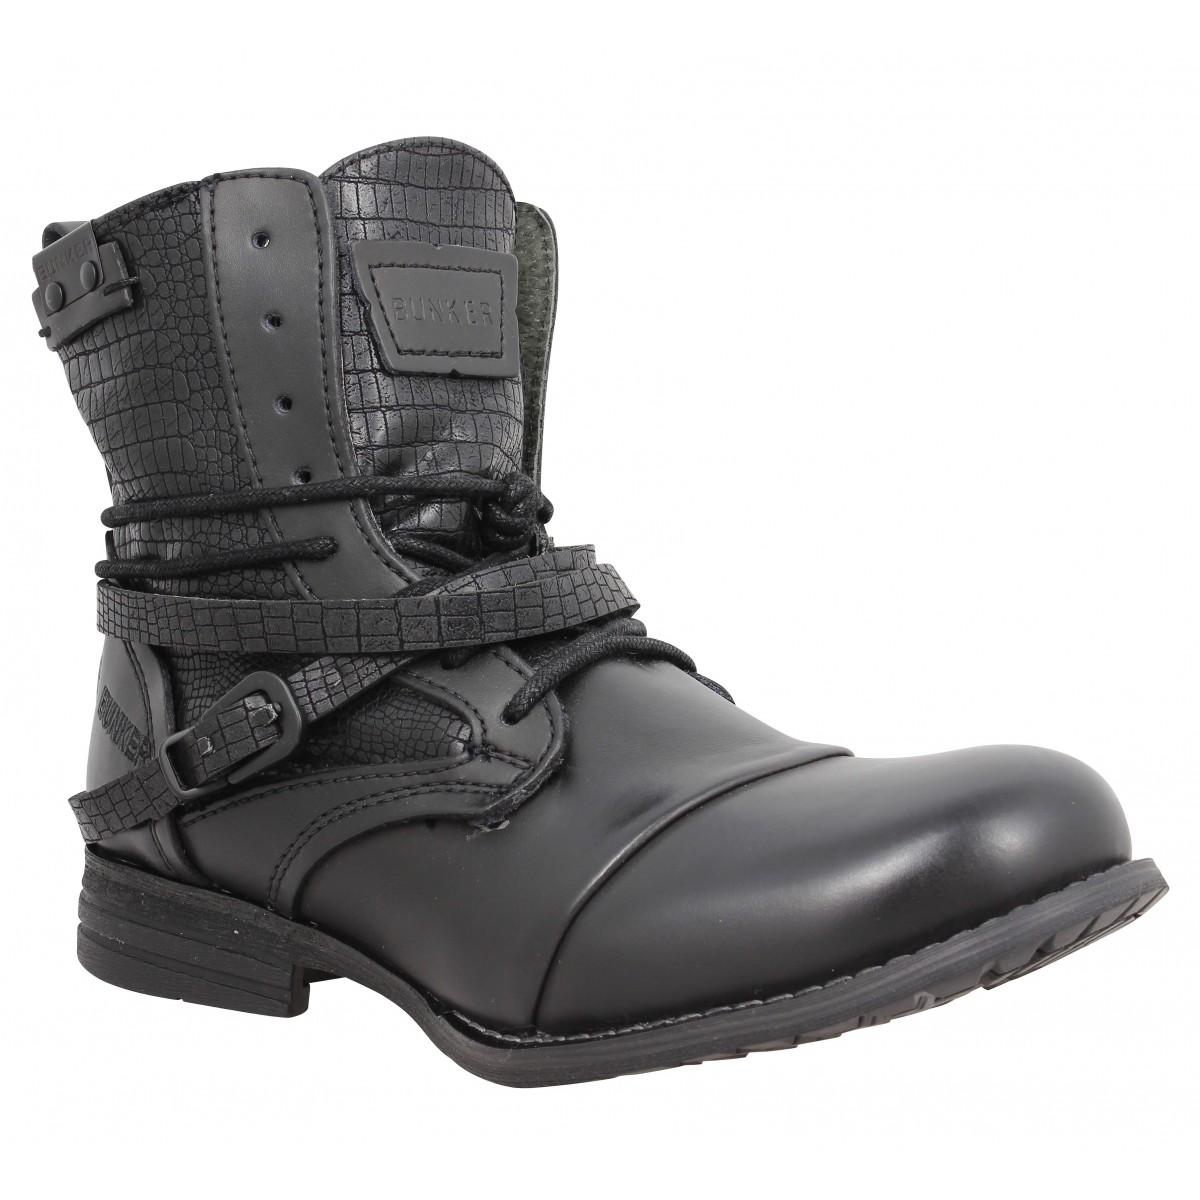 Femme Bunker Cuir Chaussures Sara Noir Lu Fanny qAUEBpxSn